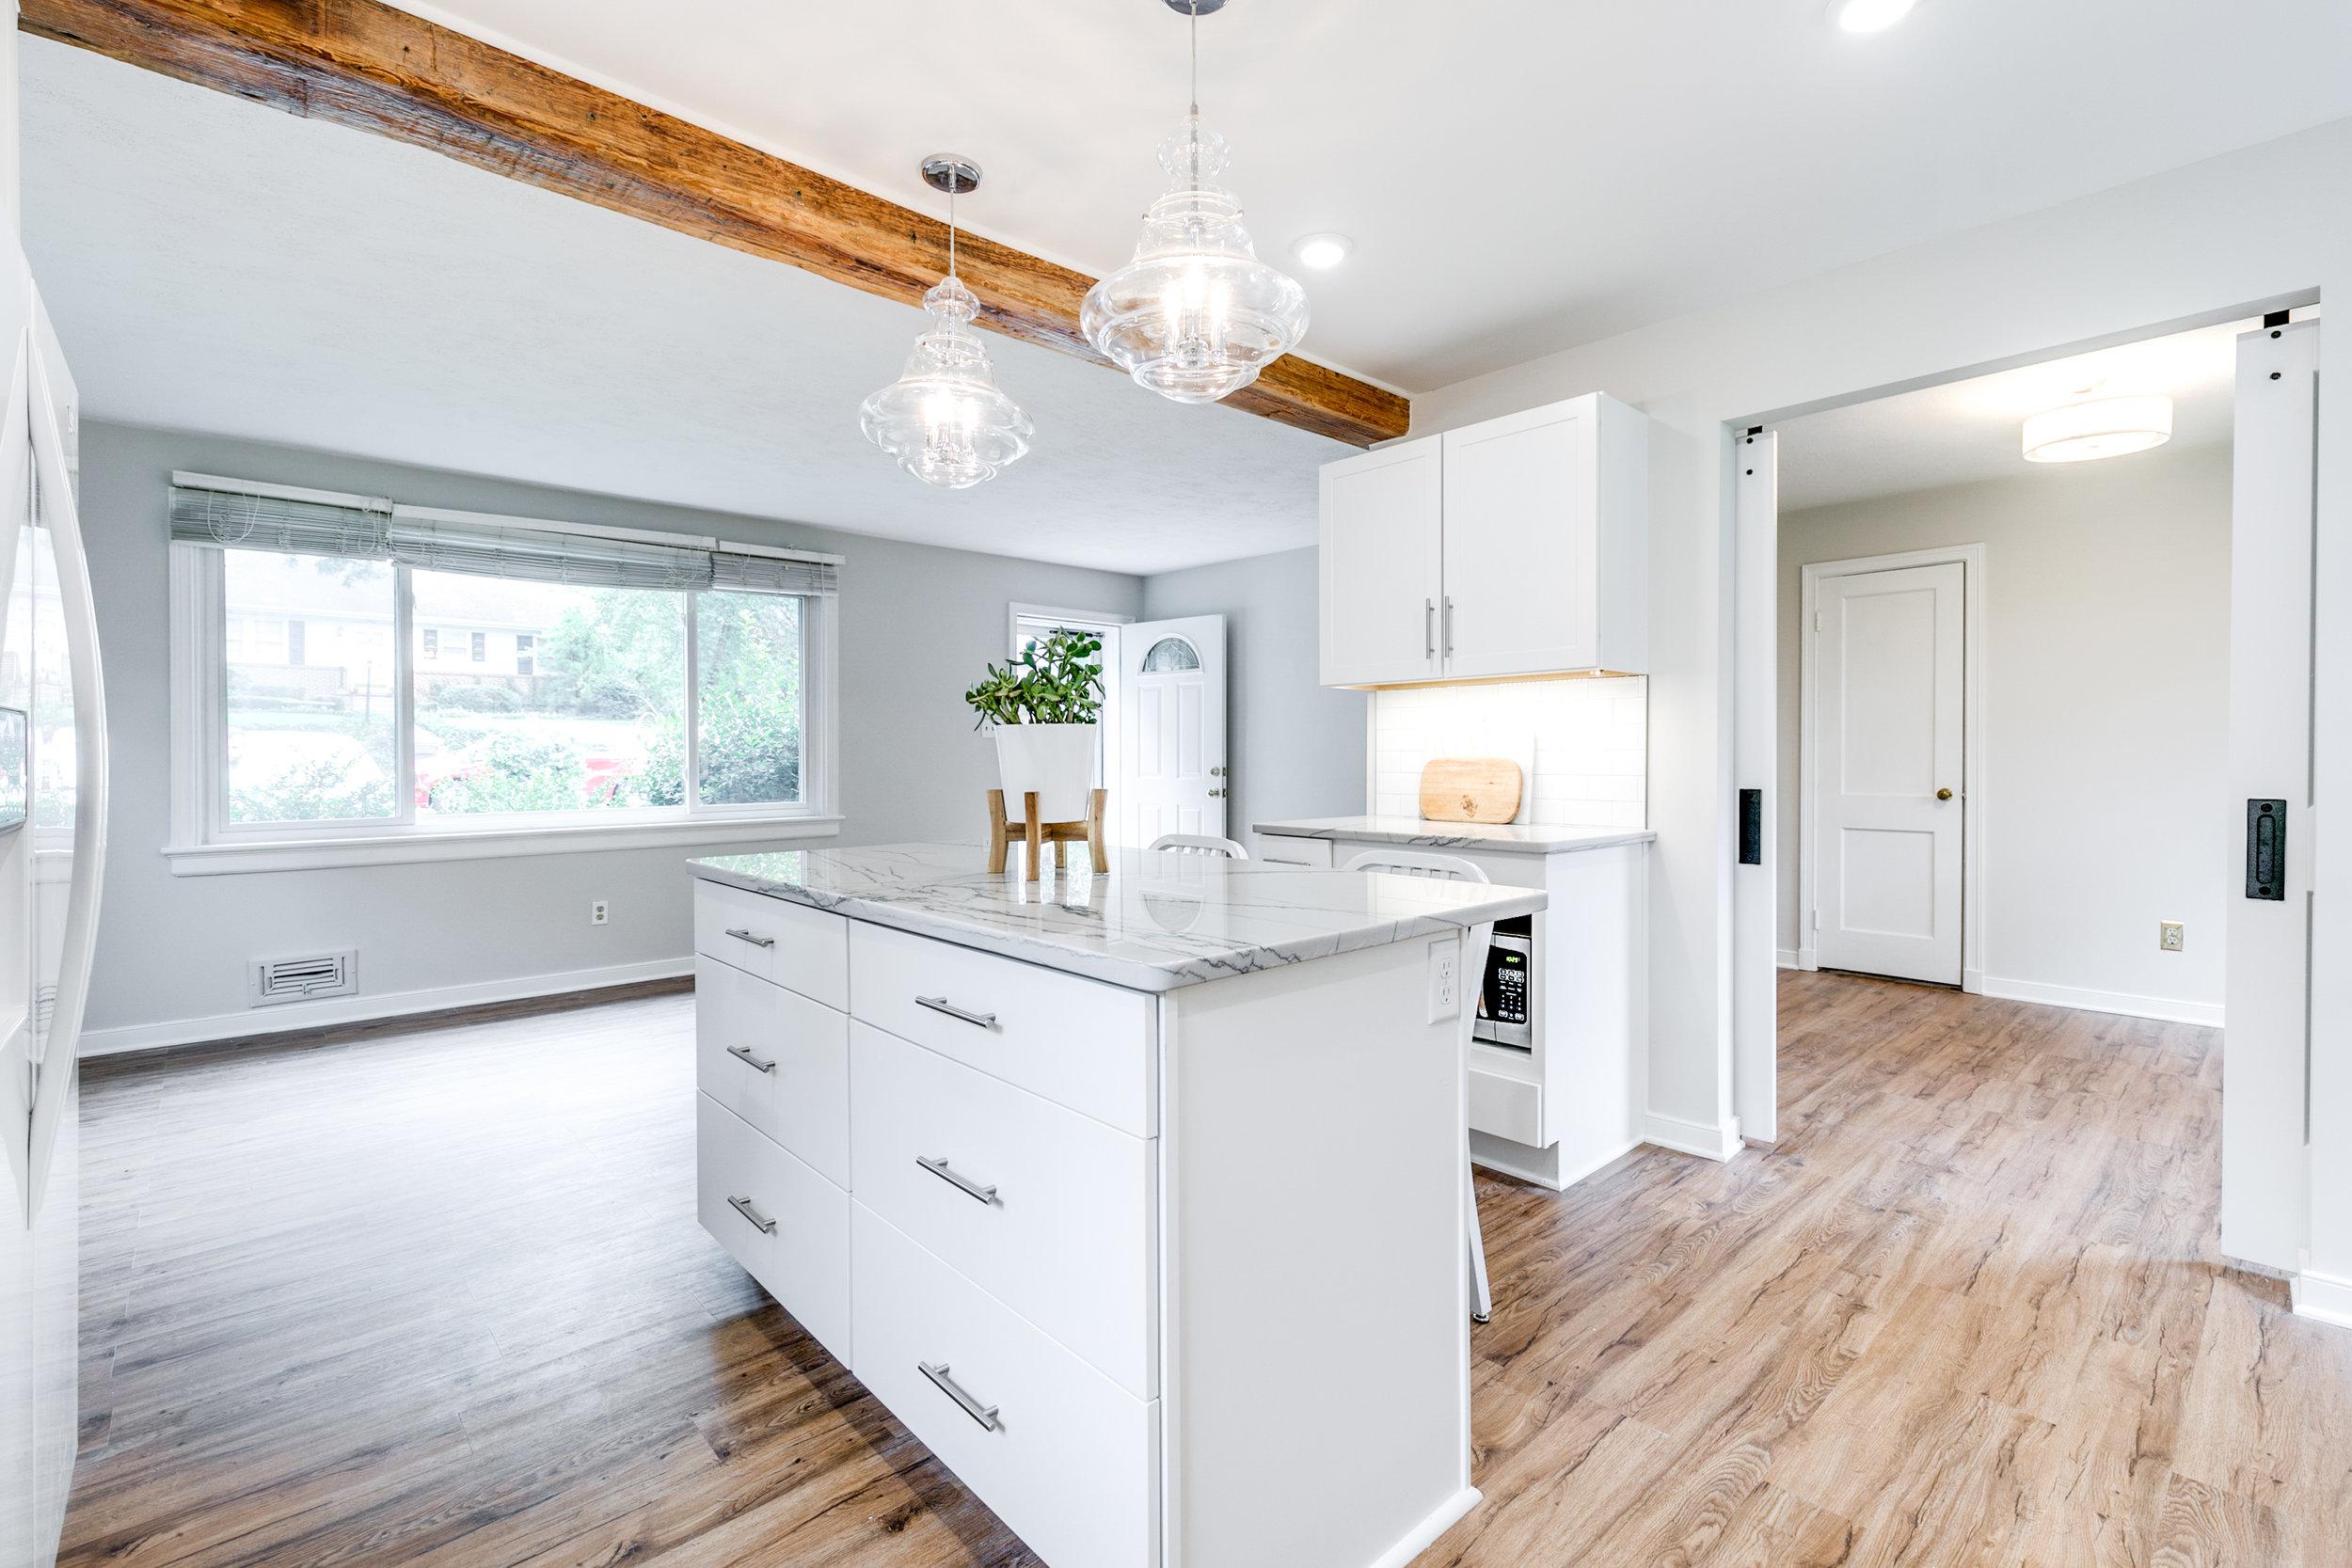 1406 Coronet Drive Kitchen (16 of 40).jpg